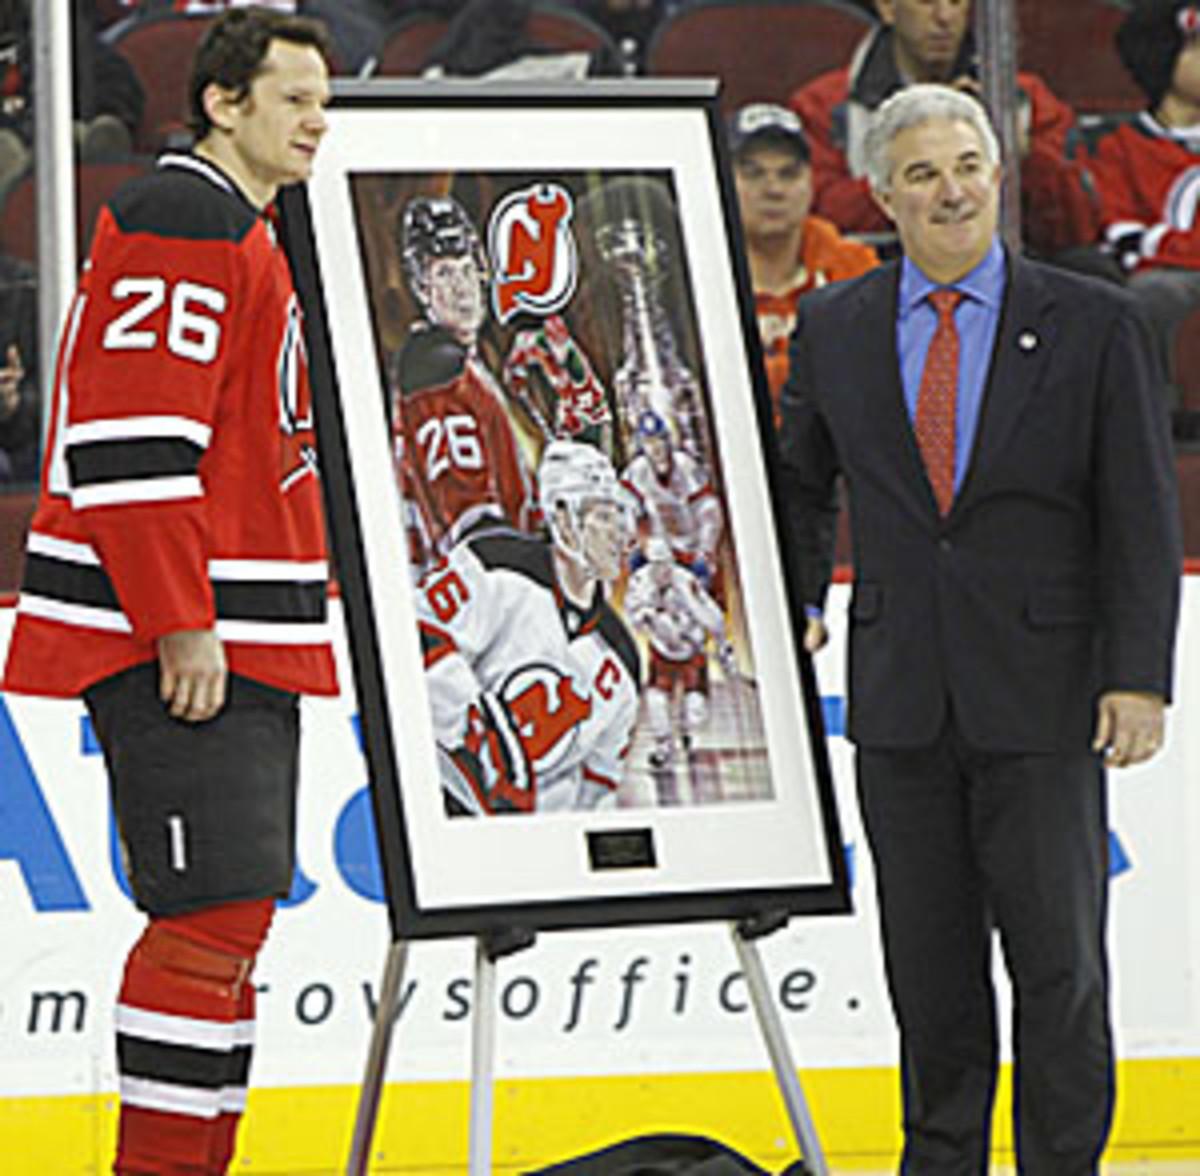 Devils owner Jeff Vanderbeek is in danger of defaulting on a $40 million loan.